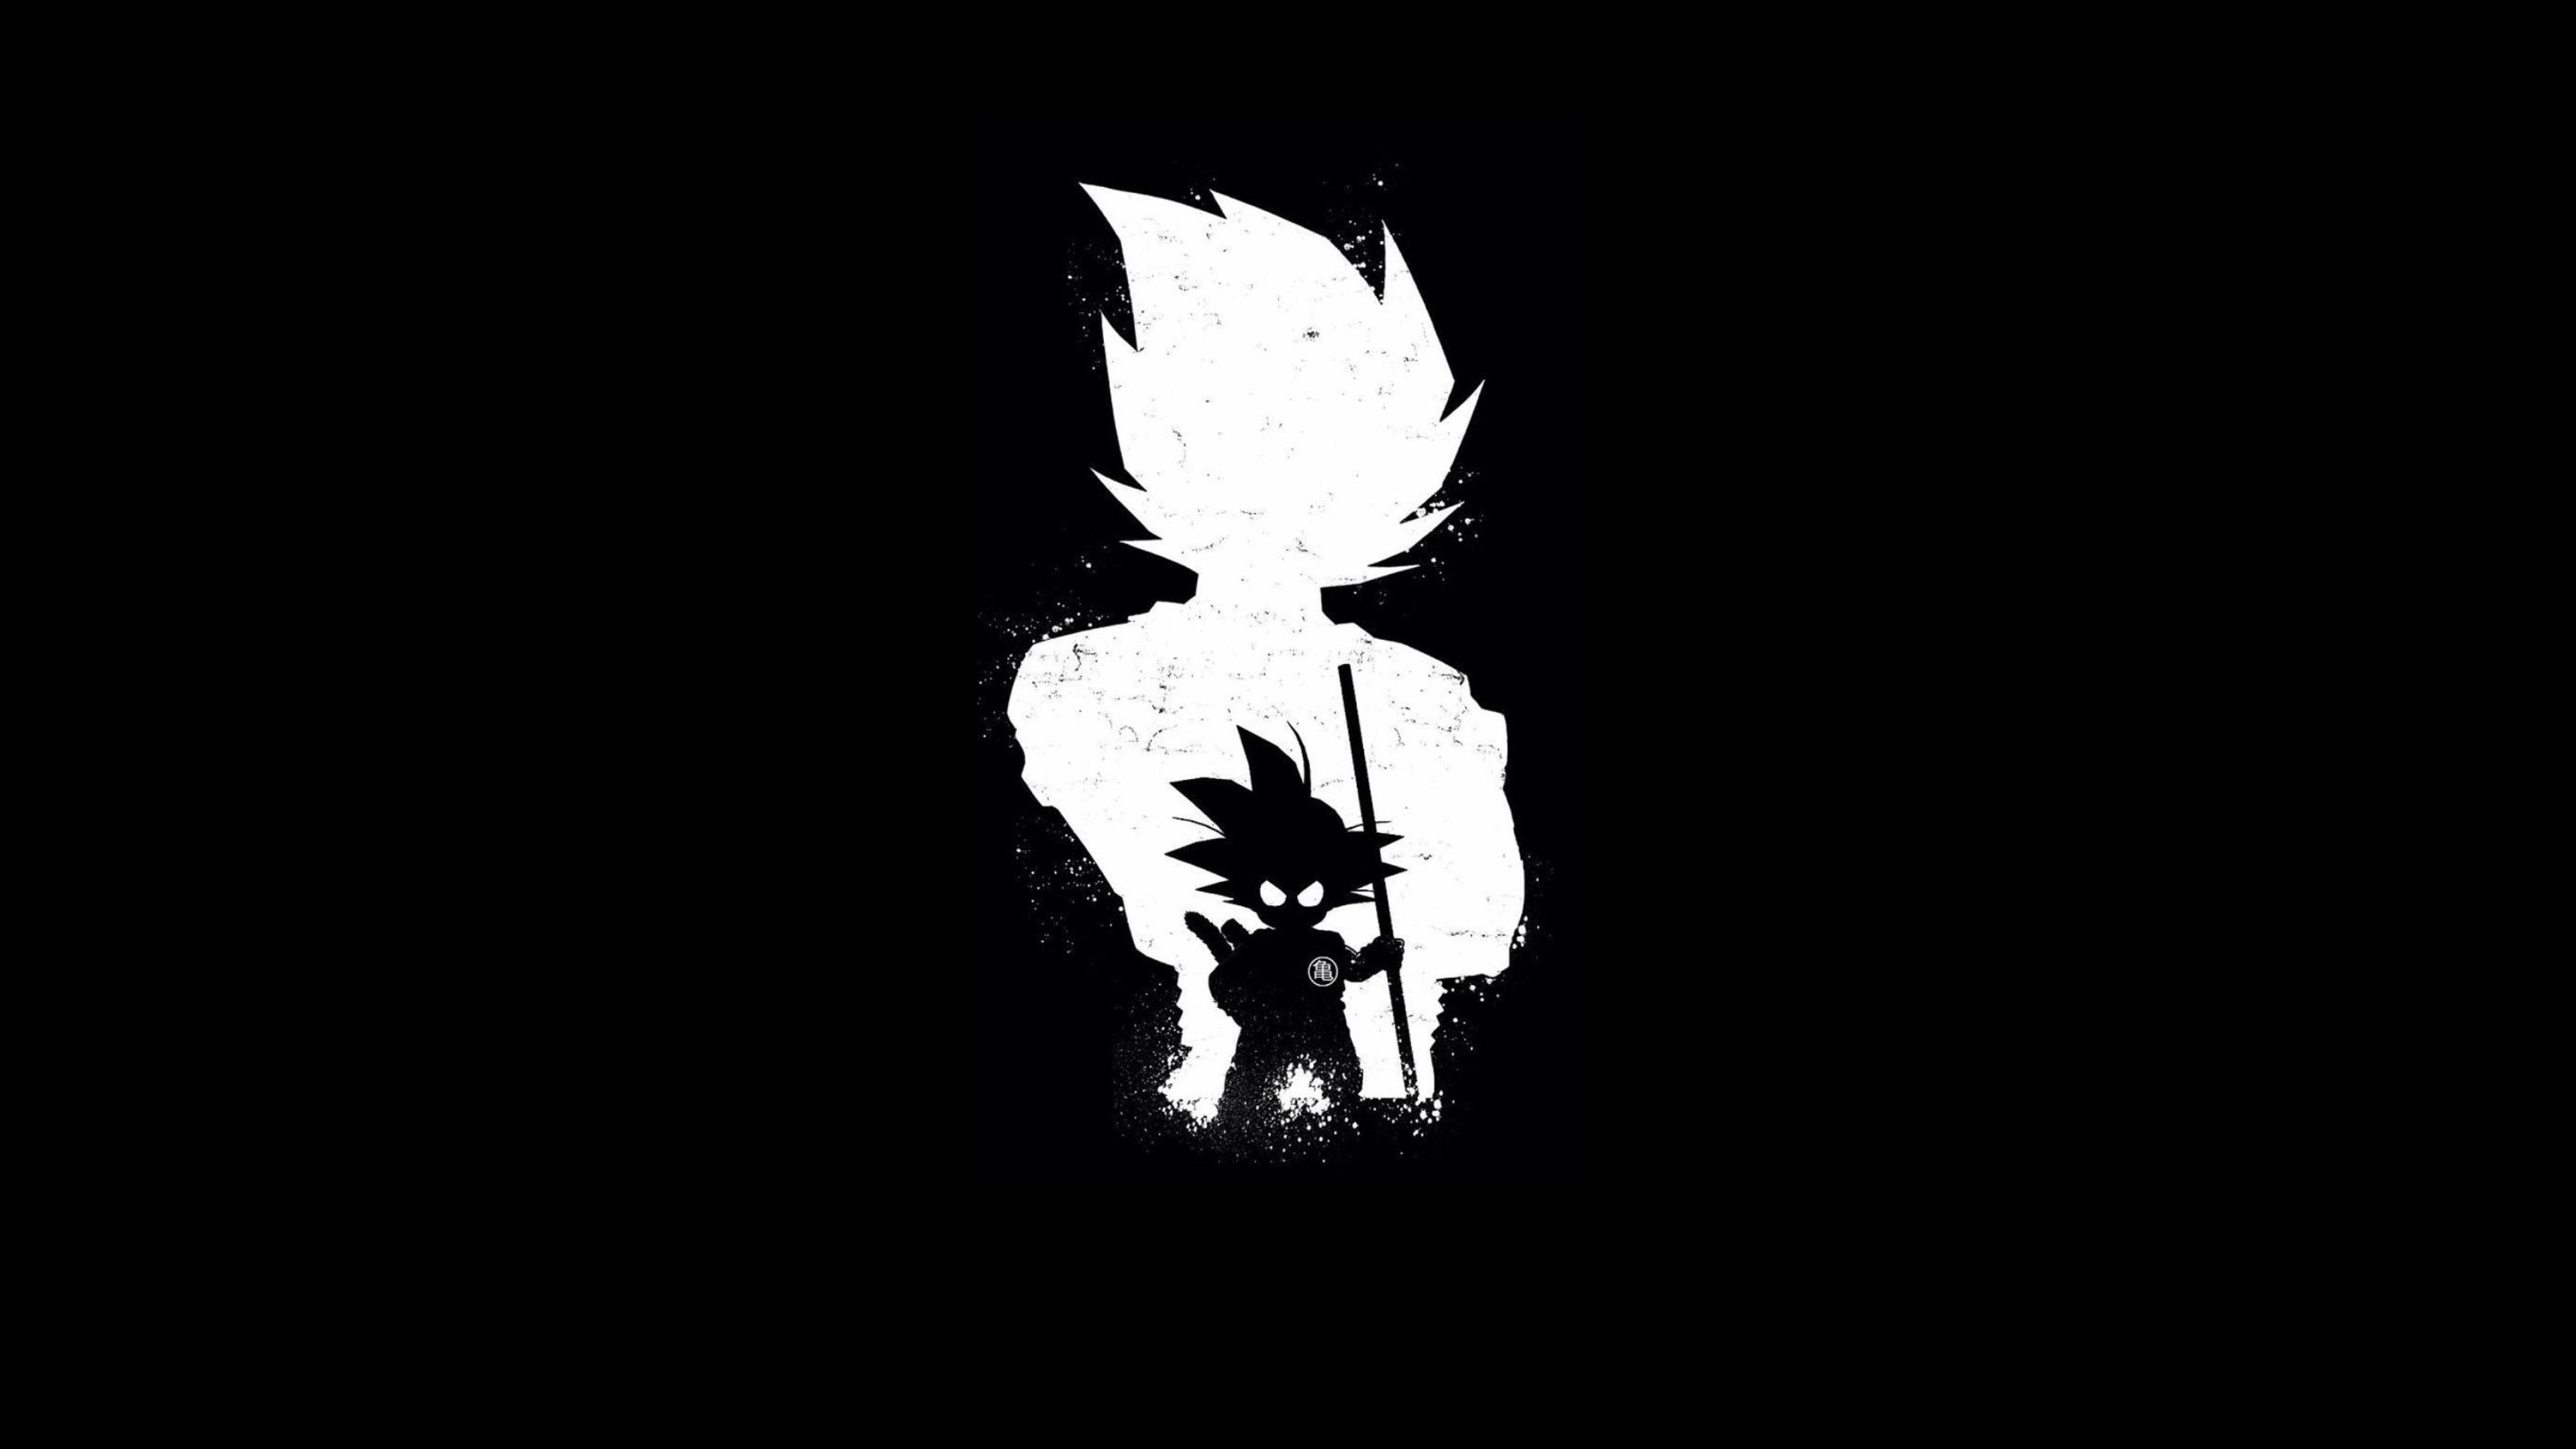 anime dark wallpapers 4k: Goku Anime Dark Black, HD 4K Wallpaper